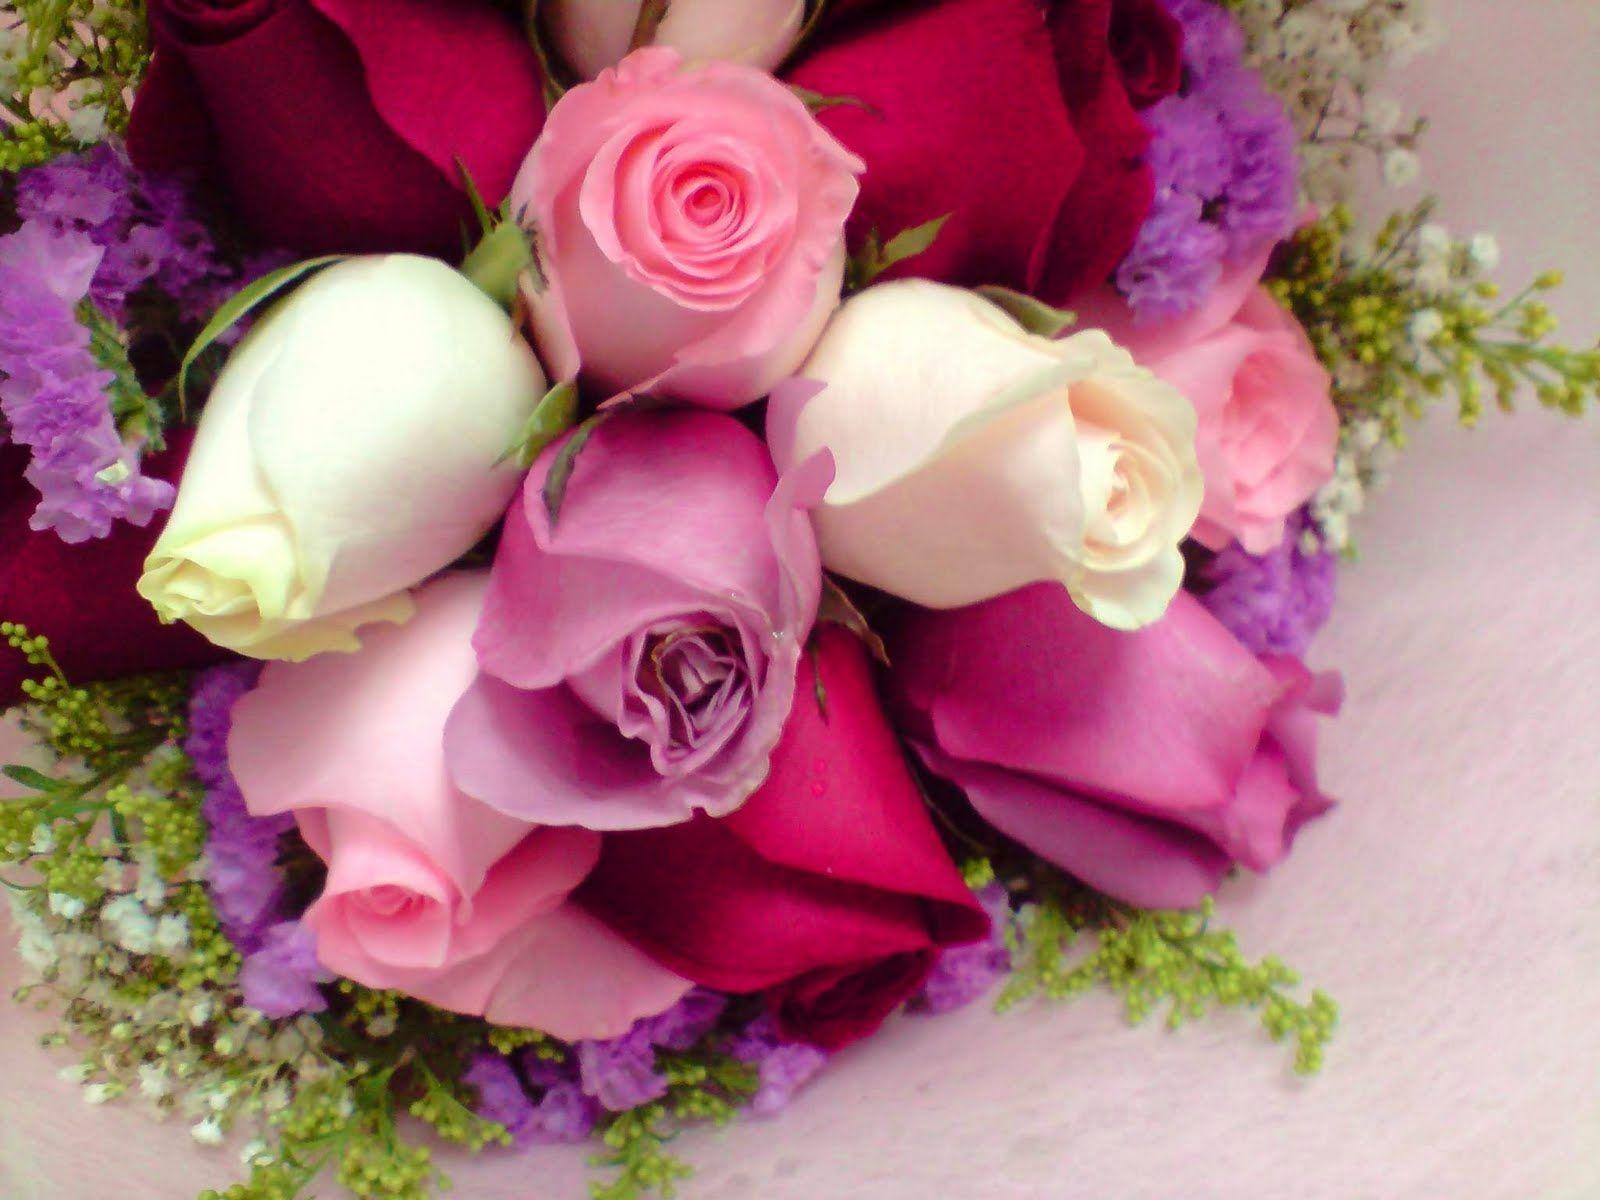 happy birthday bouquet wallpaper - photo #43